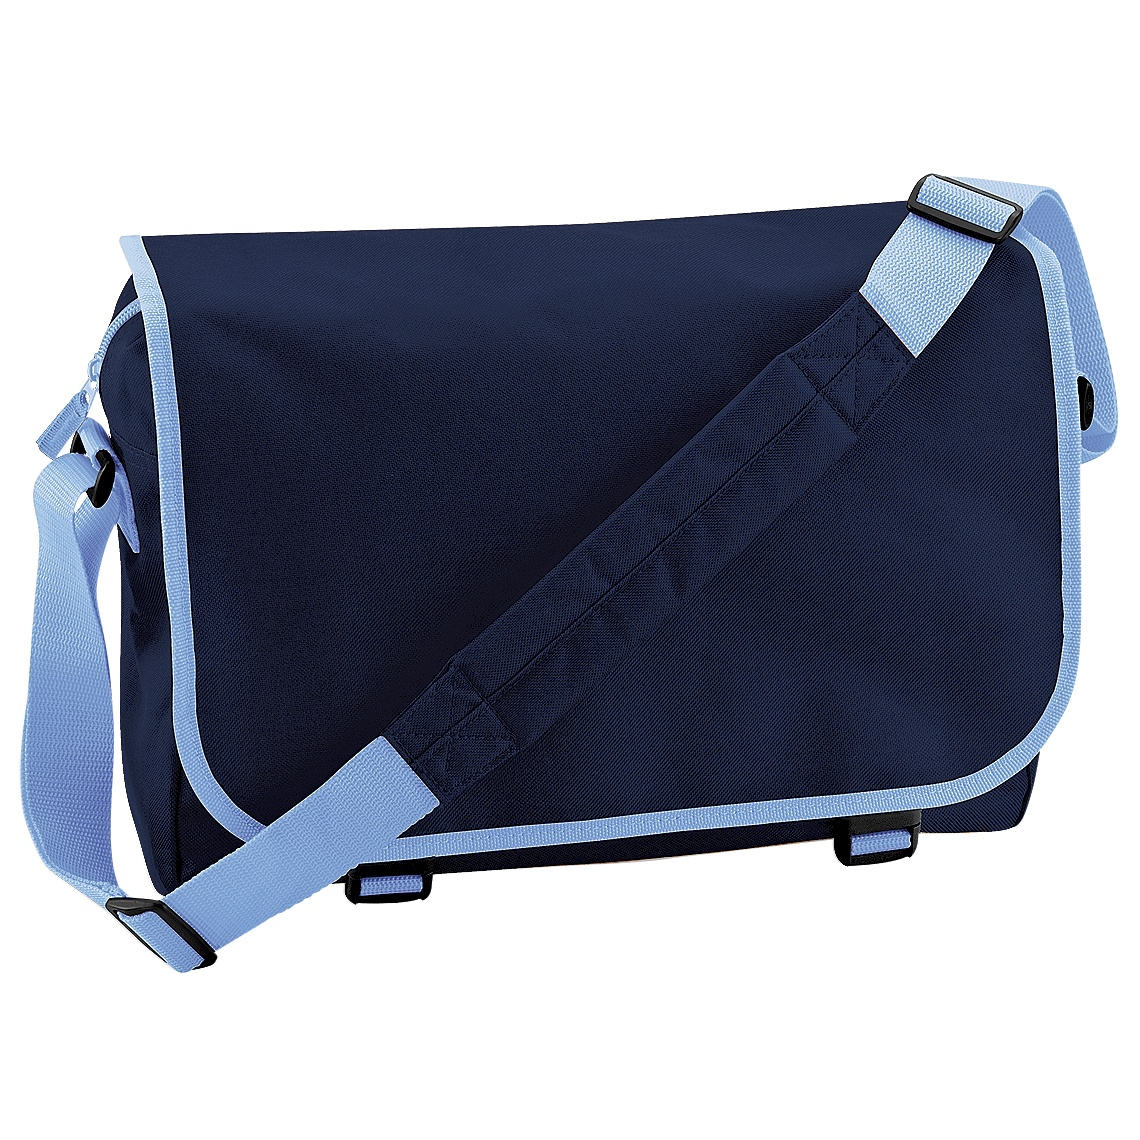 Excellent  Shoes Amp Accessories Gt Men39s Accessories Gt Backpacks Bags